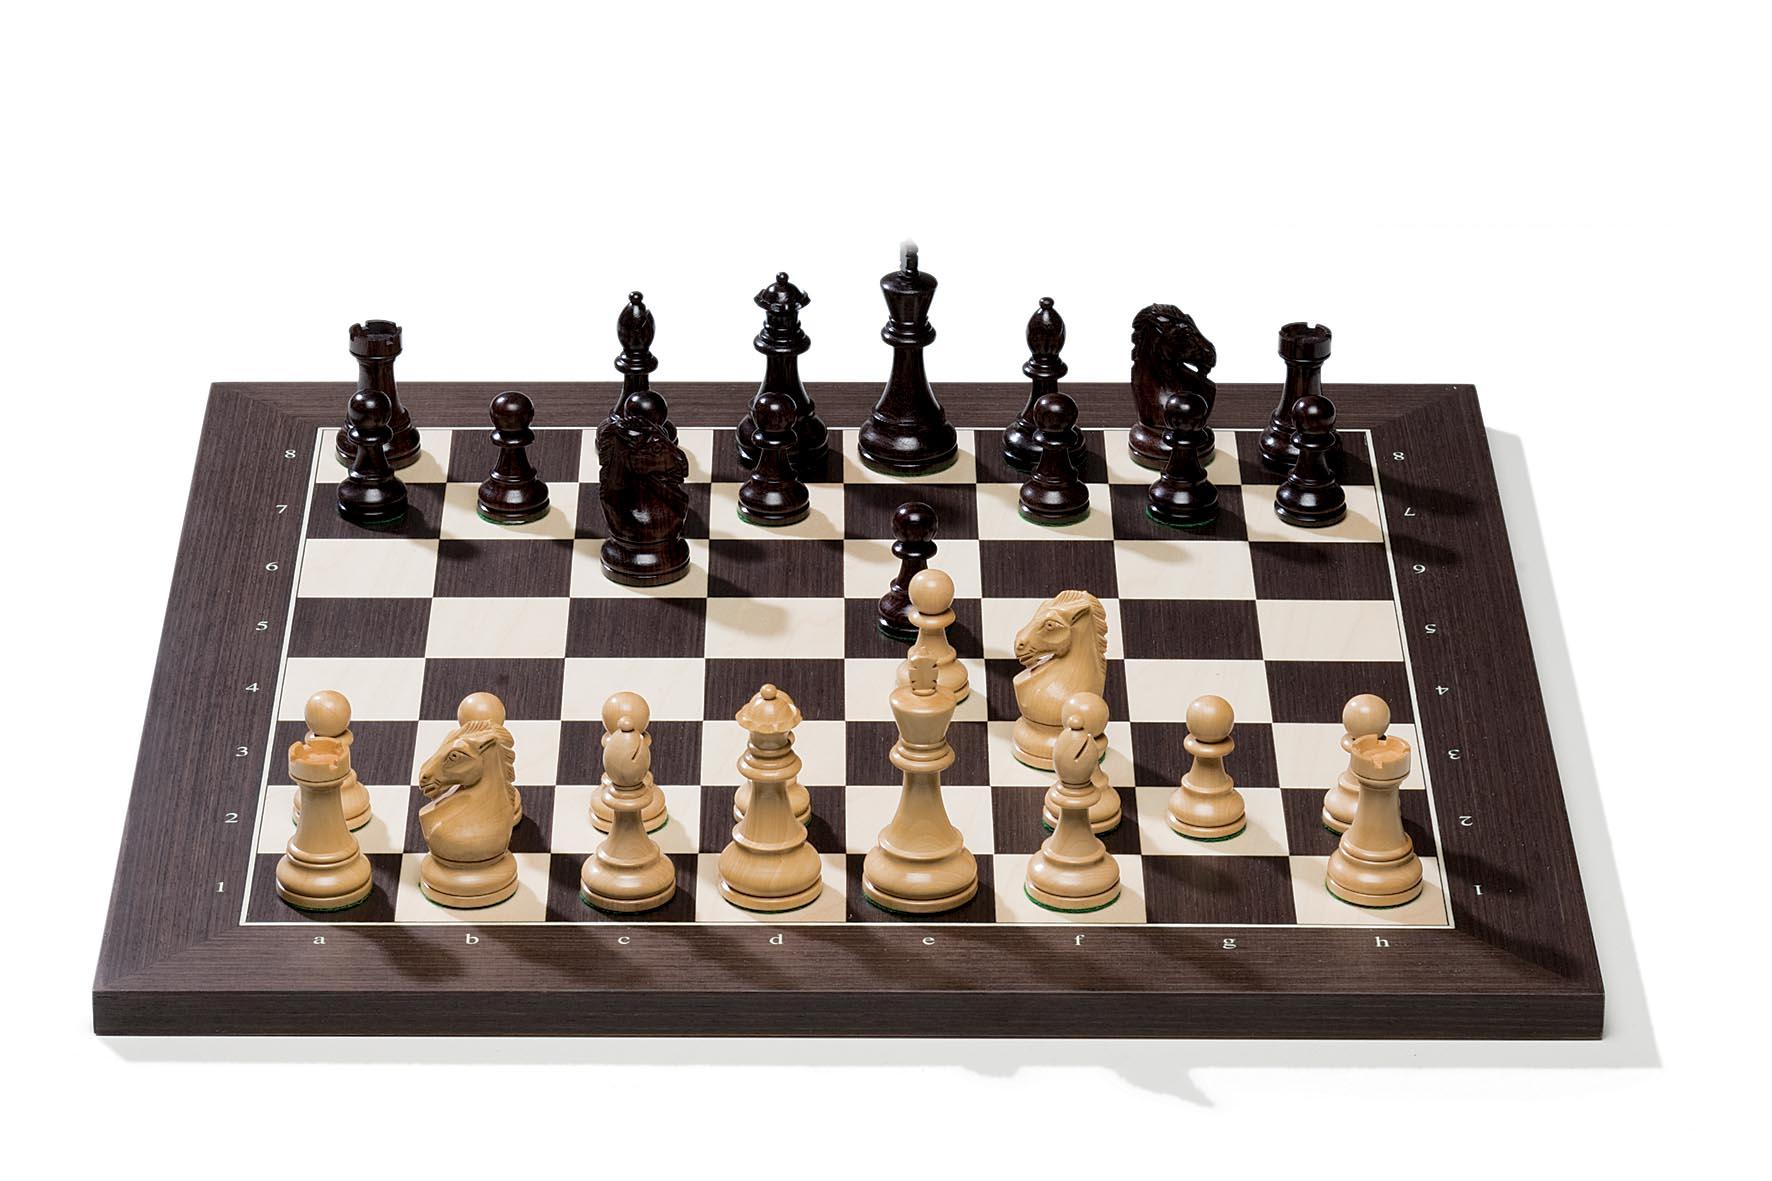 Новая награда отделения шахмат МСШ Комрата